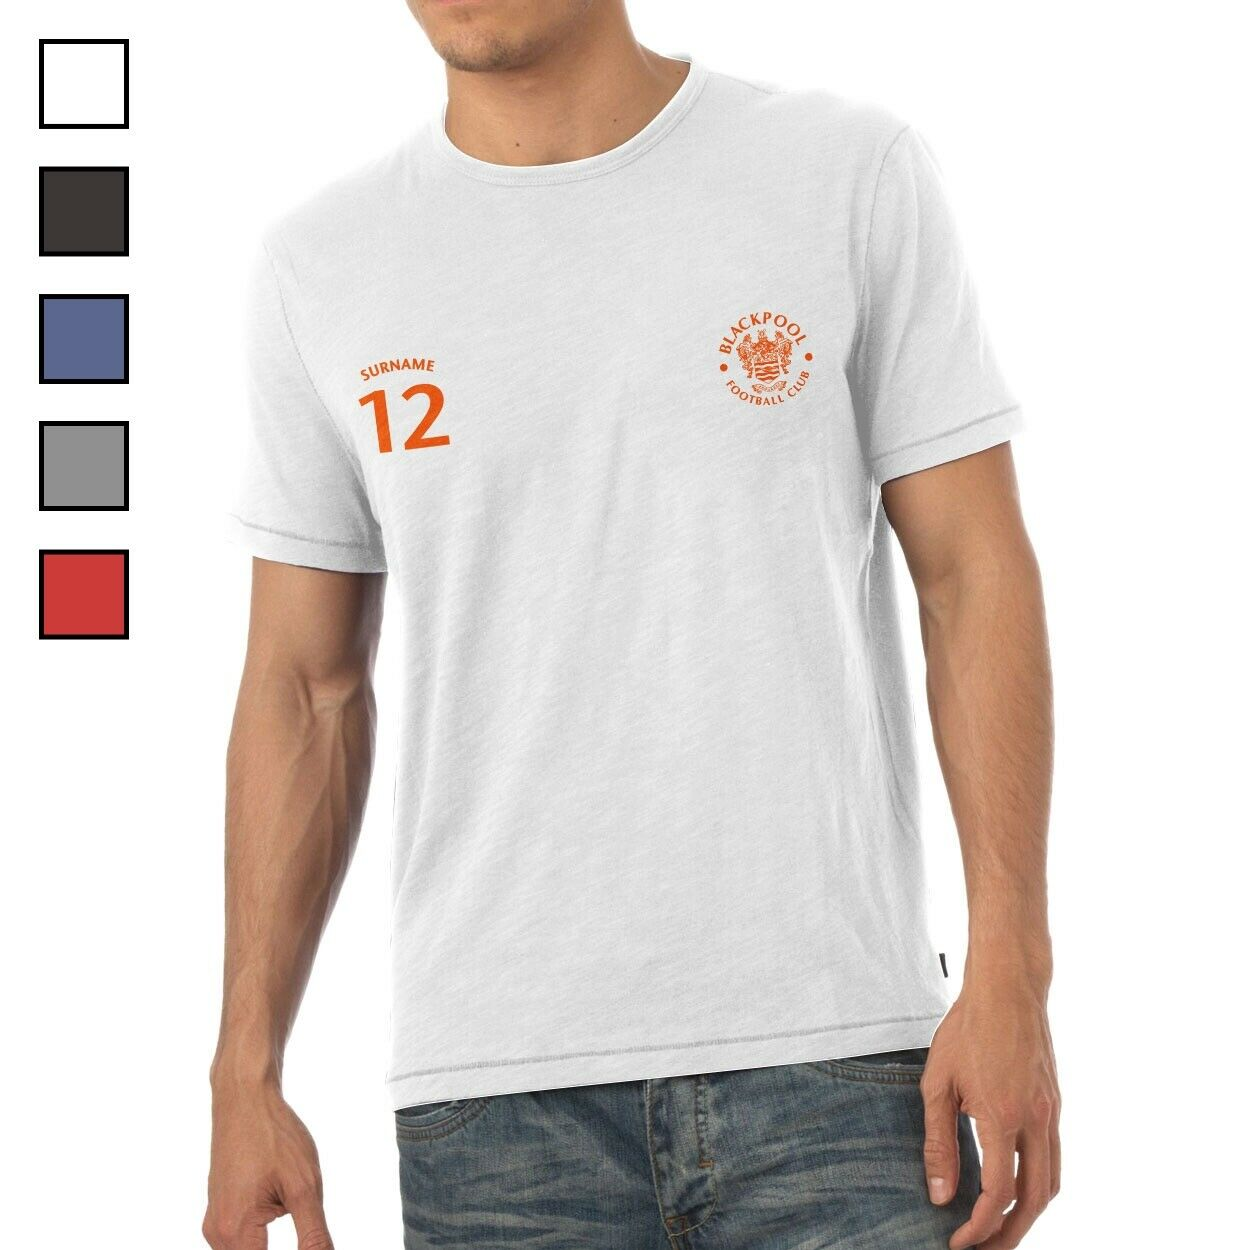 Blackpool F.C - Personalised Mens T-Shirt (SPORTS)